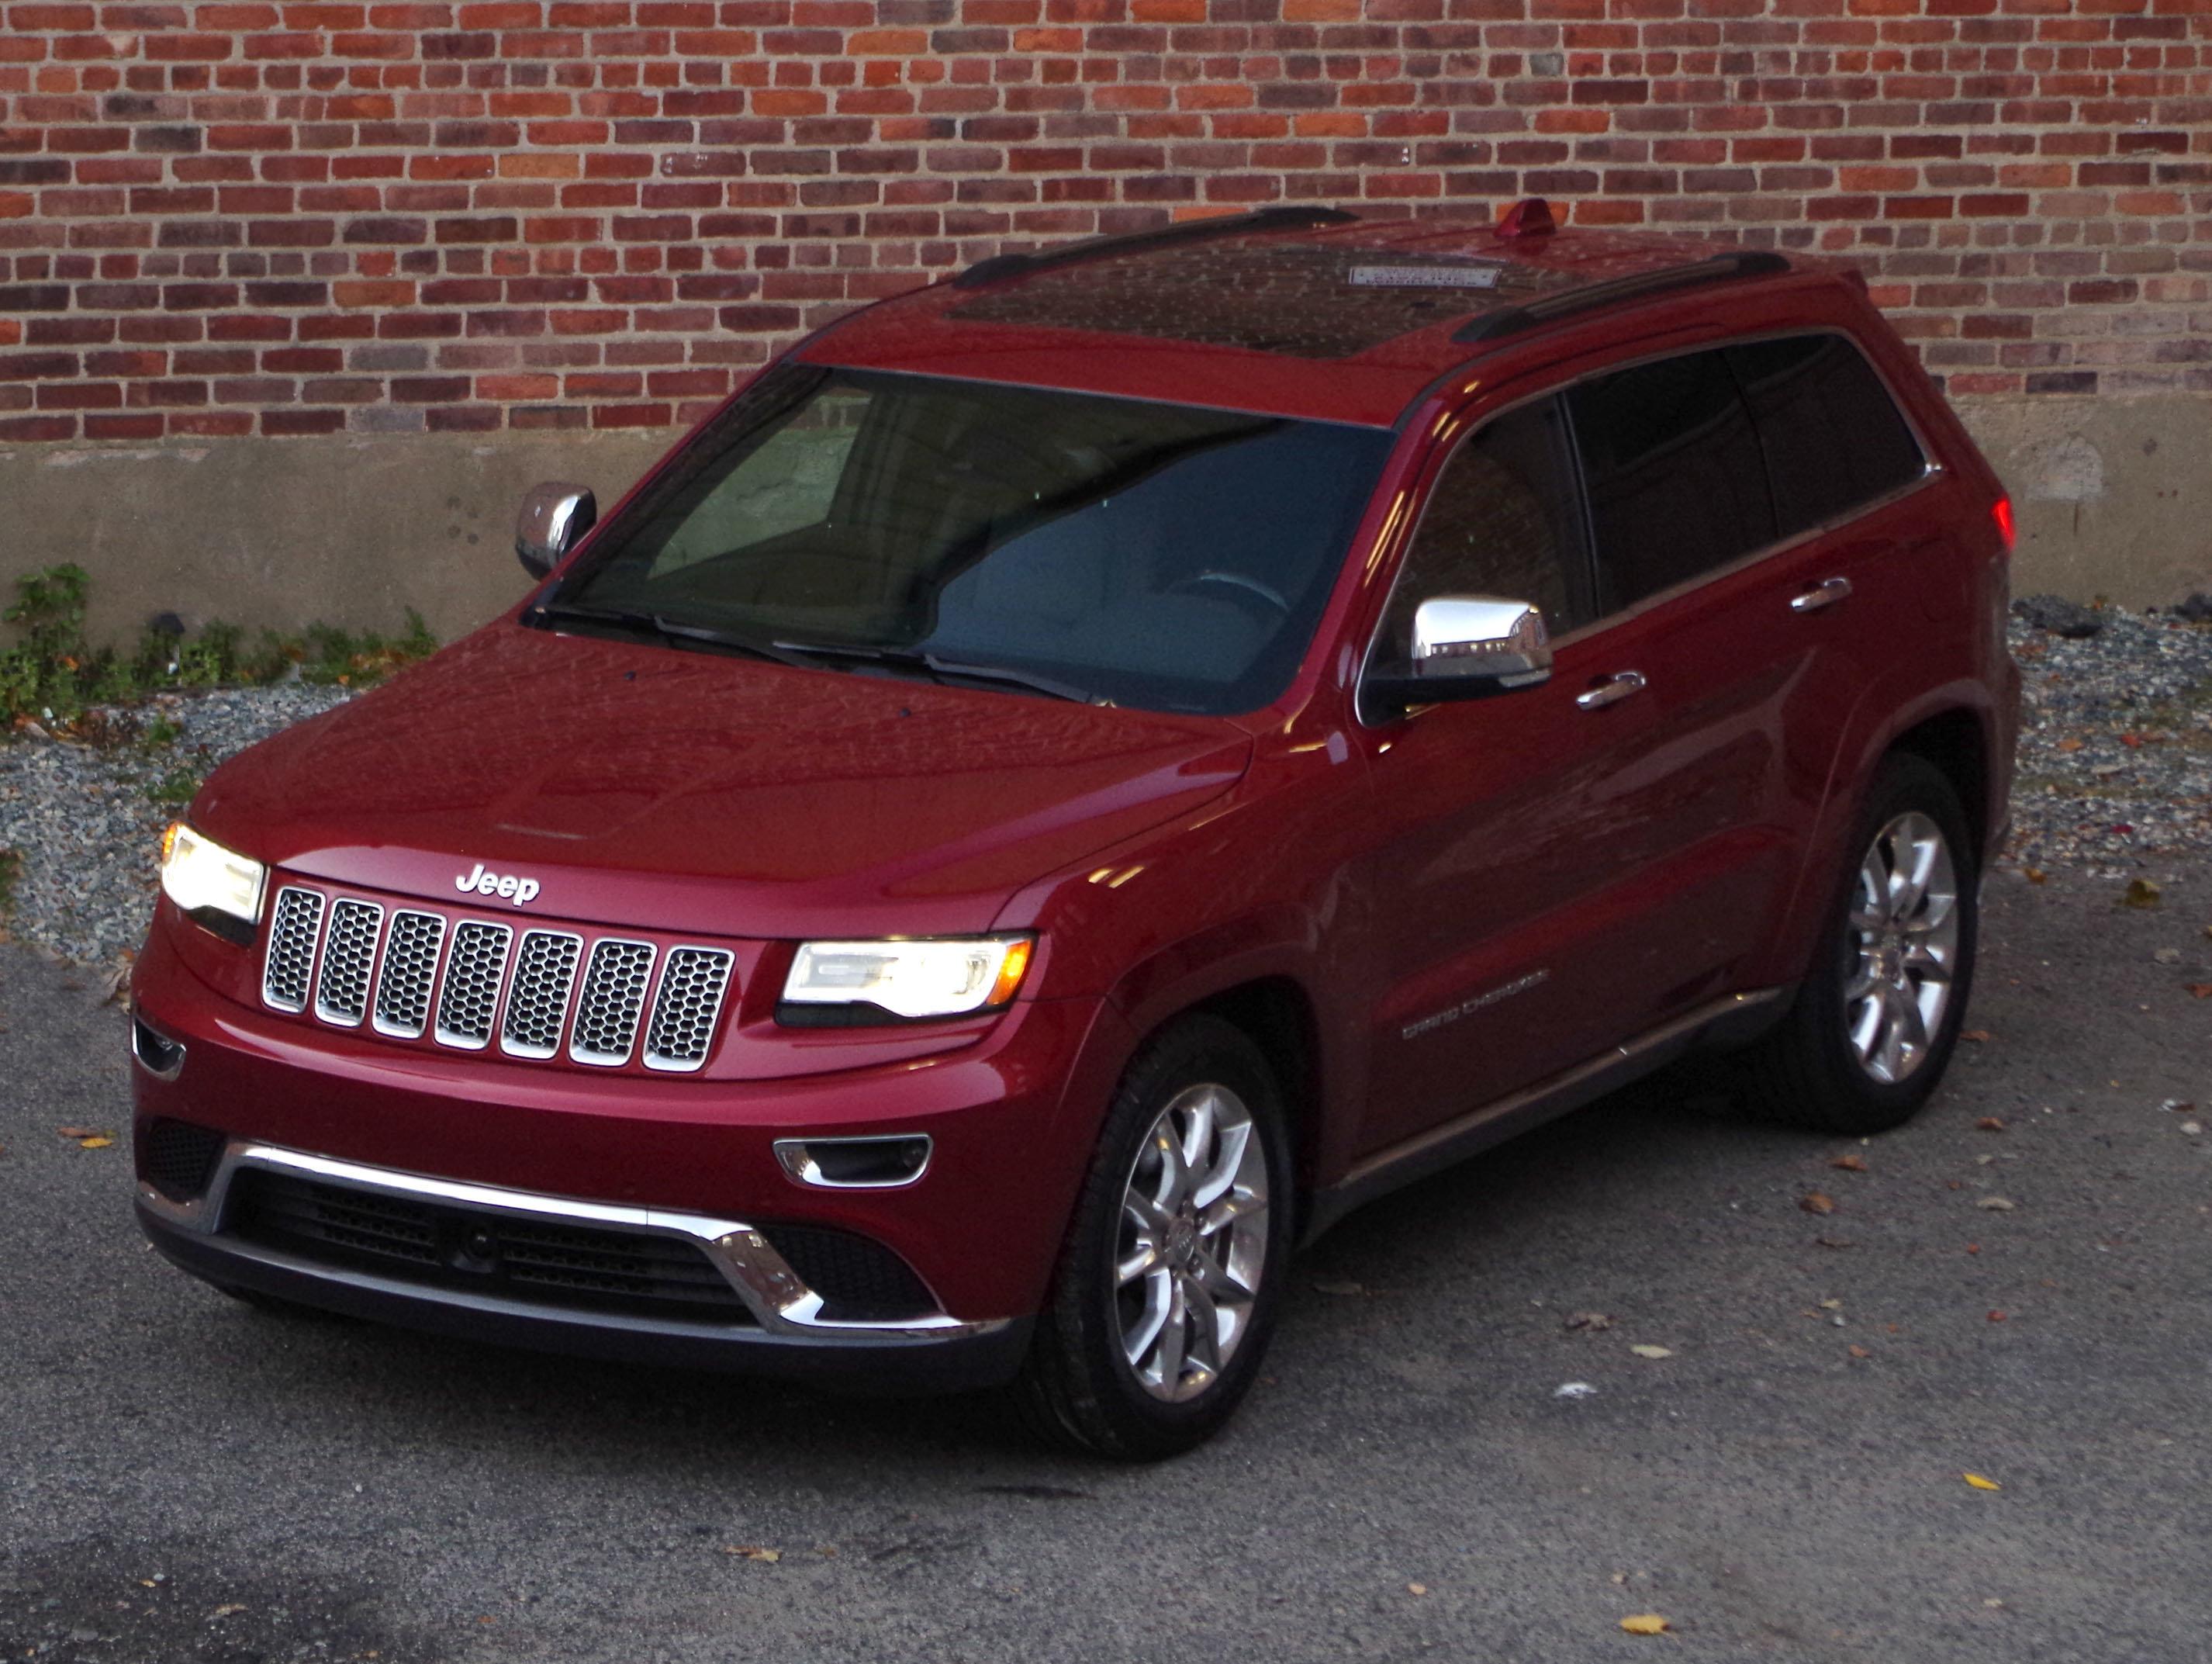 2014 jeep grand cherokee diesel suv meet mpg cars. Black Bedroom Furniture Sets. Home Design Ideas